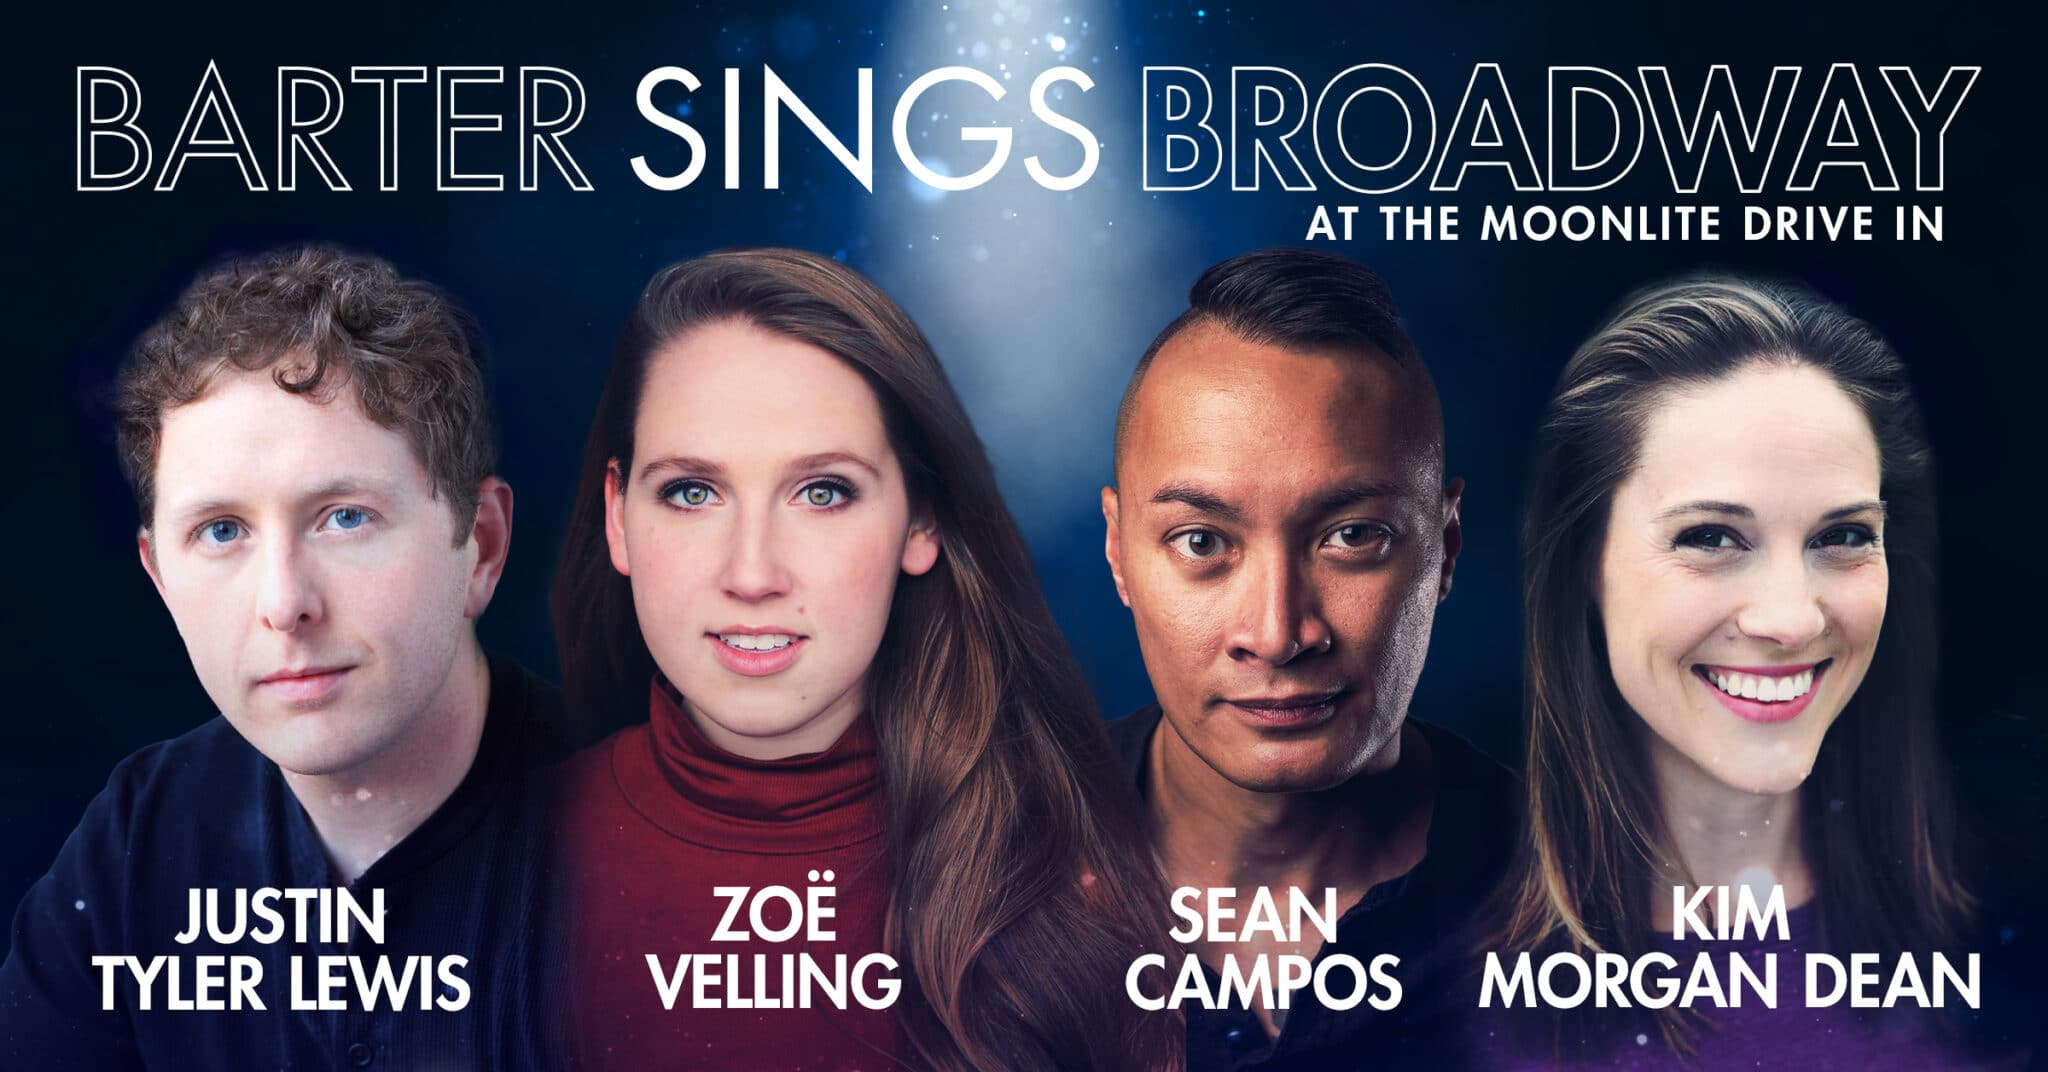 Barter Sings Broadway at the Moonlite